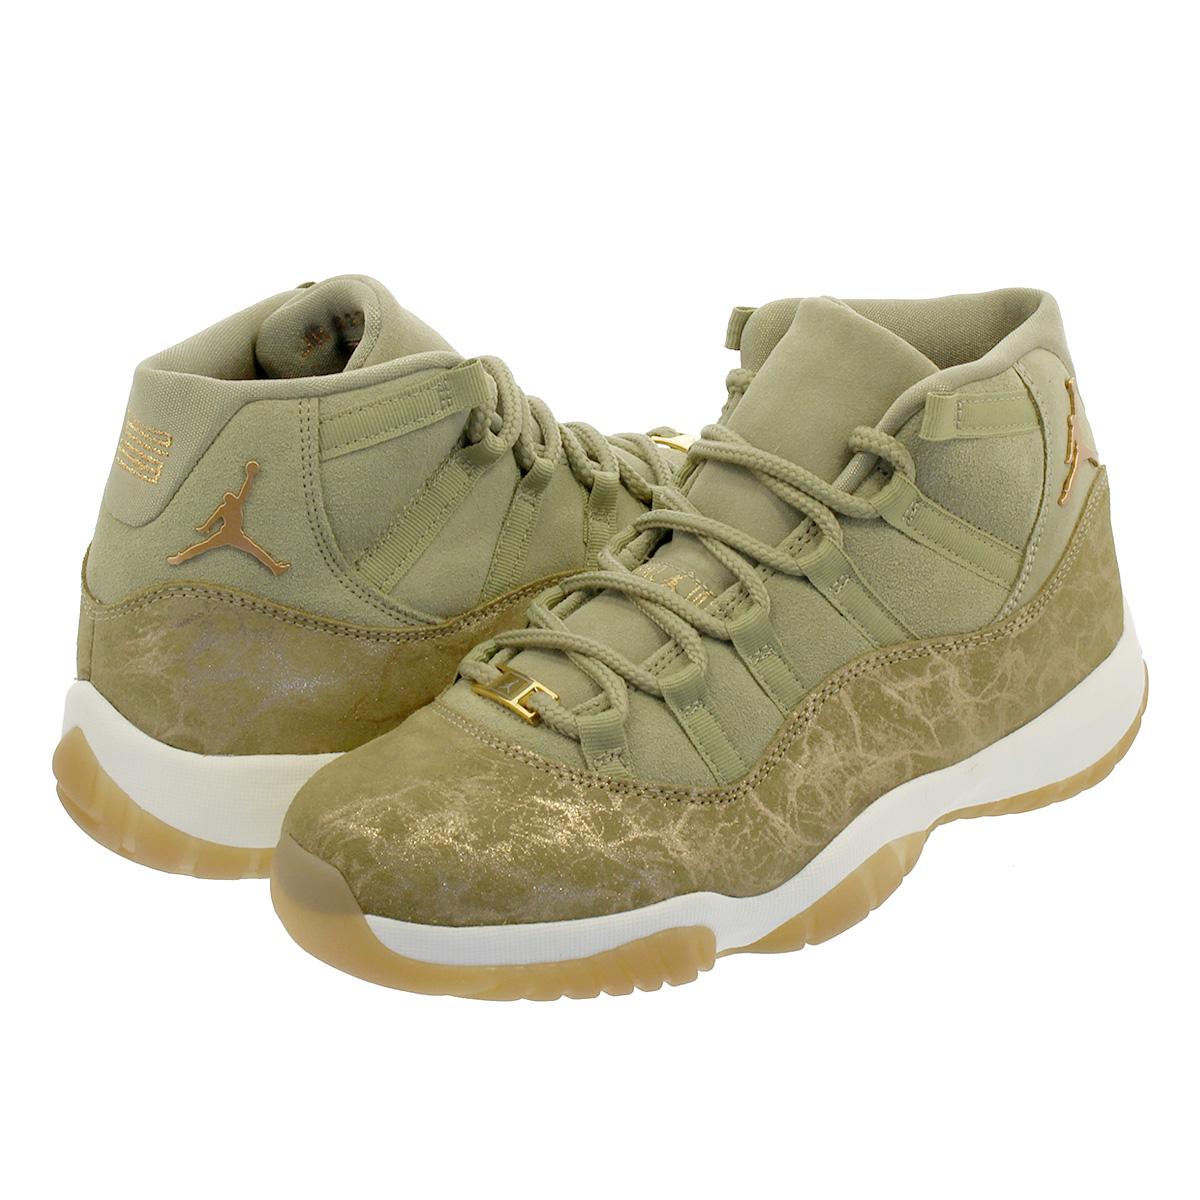 separation shoes a4f9d b8469 NIKE WMNS AIR JORDAN 11 RETRO Nike women Air Jordan 11 nostalgic NEUTRAL  OLIVE/MTLC STOUT/SAIL ar0715-200